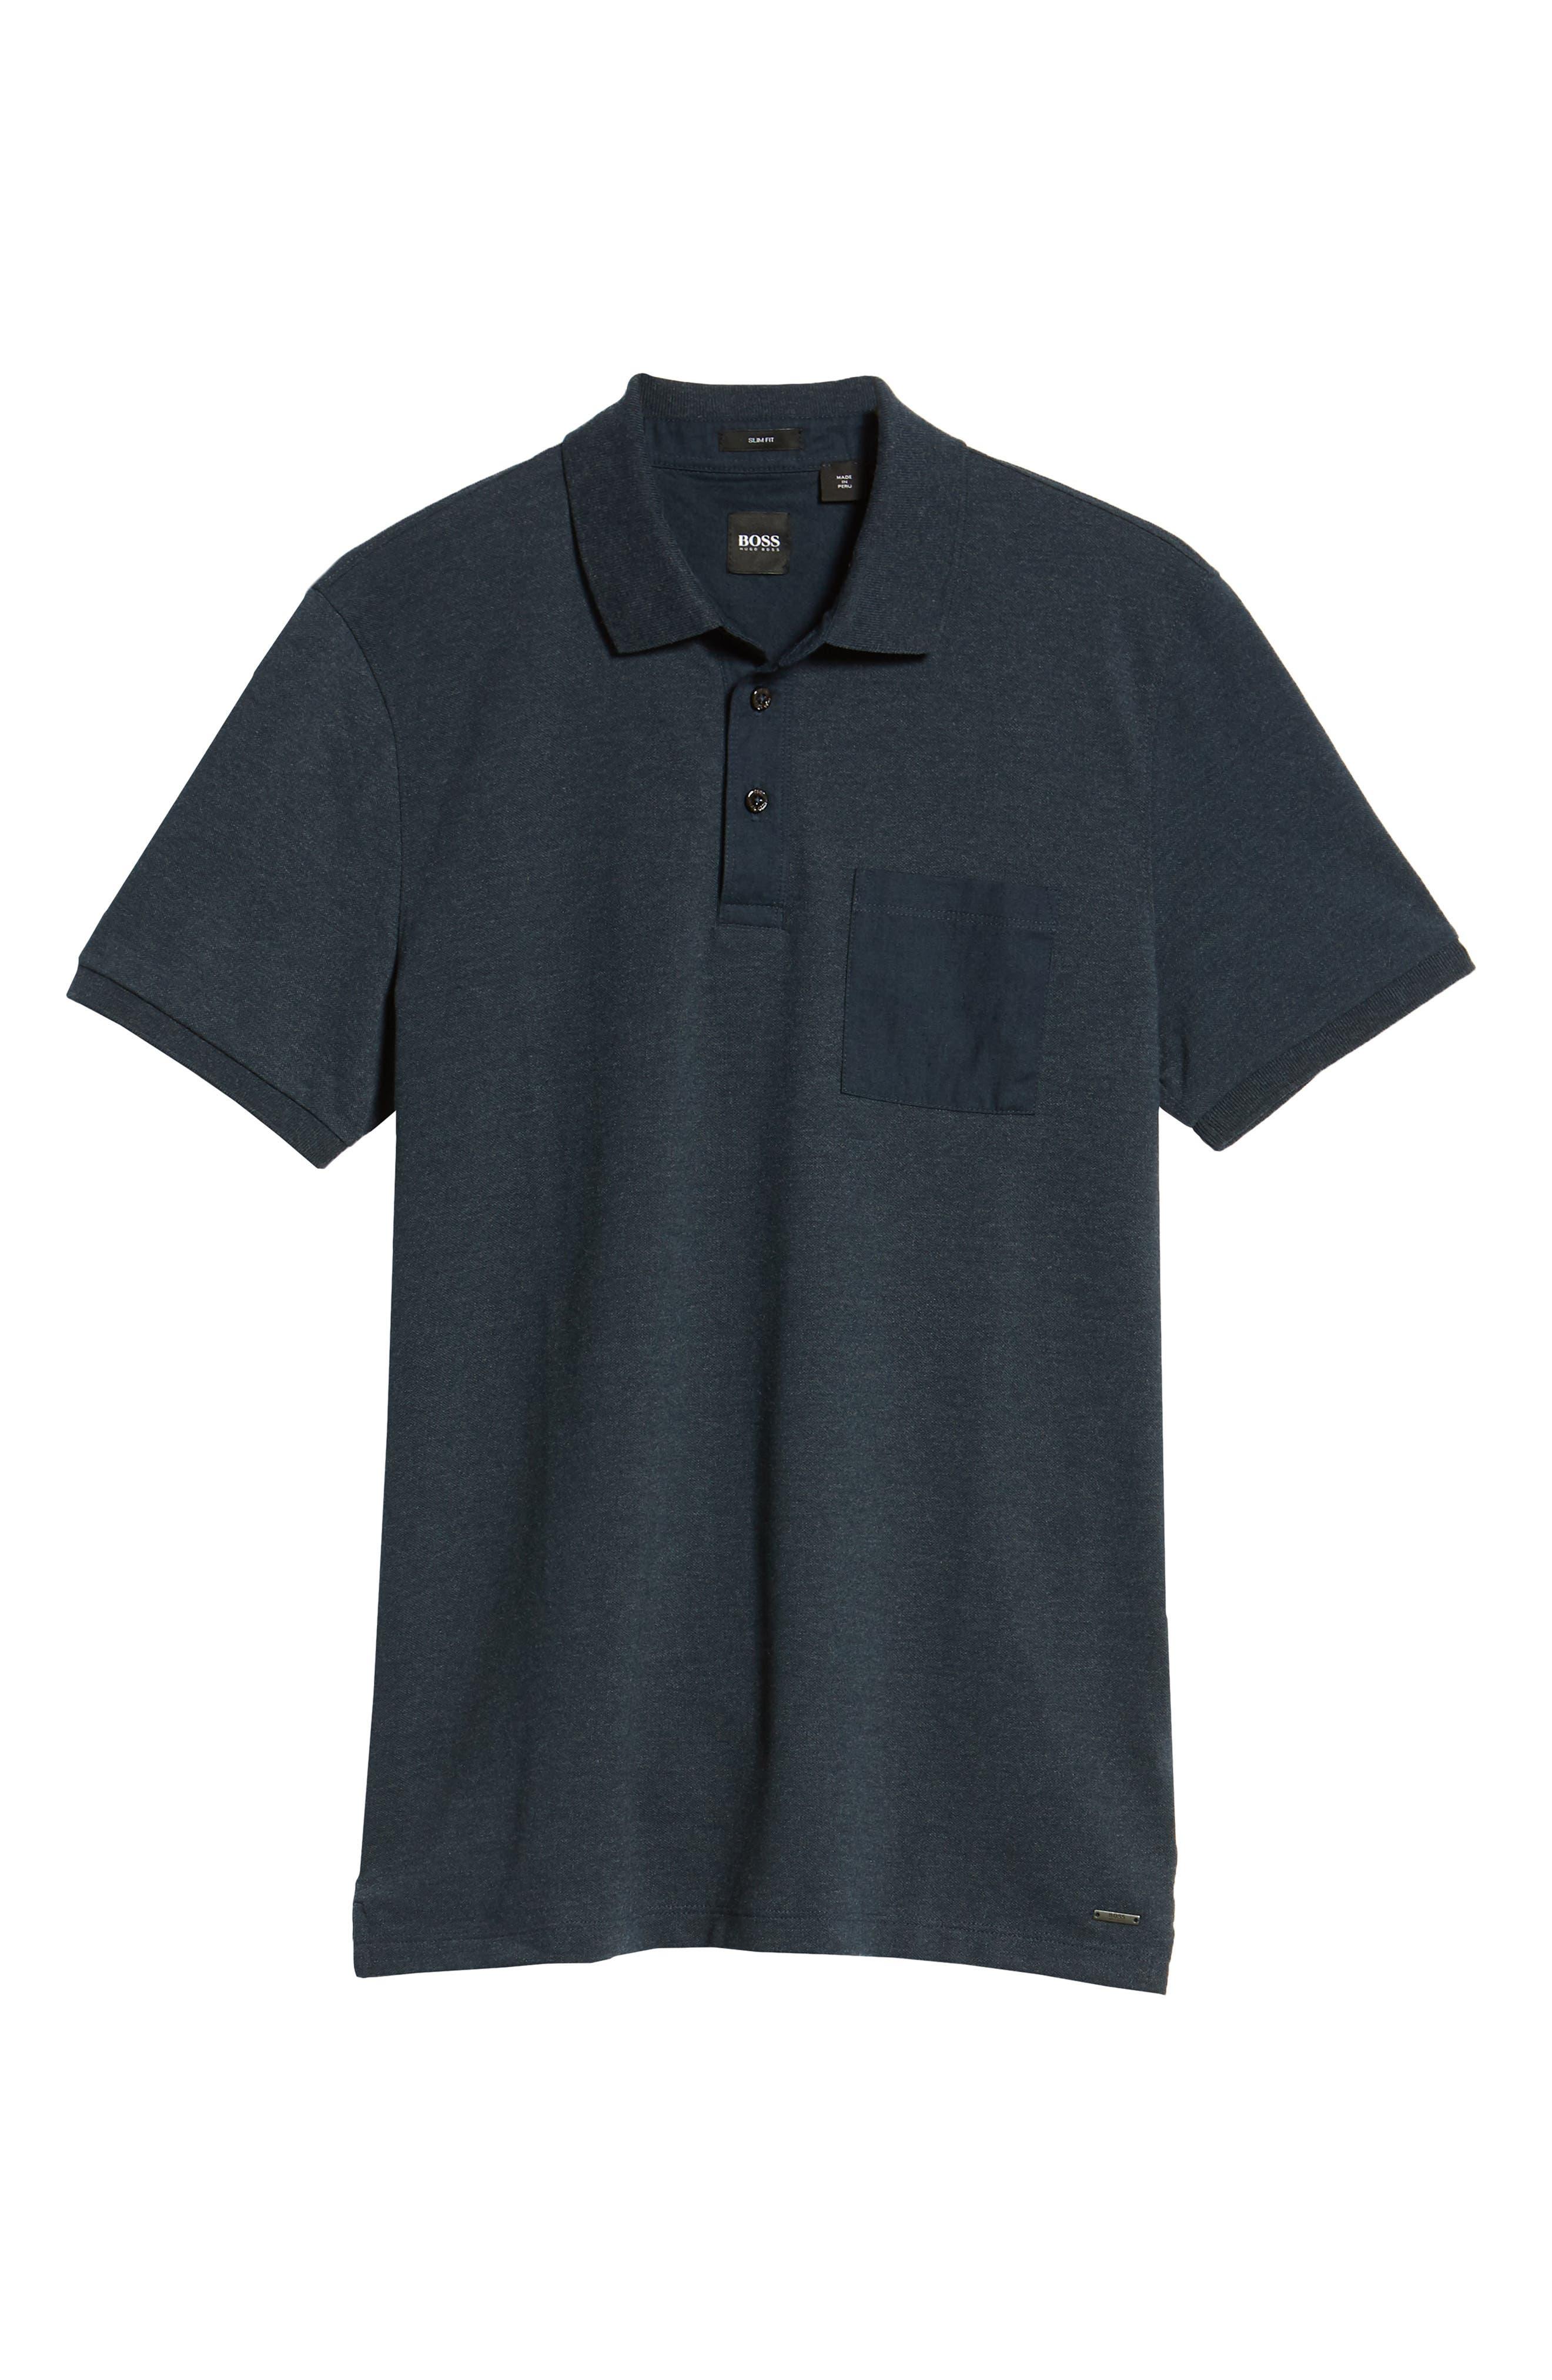 Penrose Polo Shirt,                             Alternate thumbnail 6, color,                             Blue